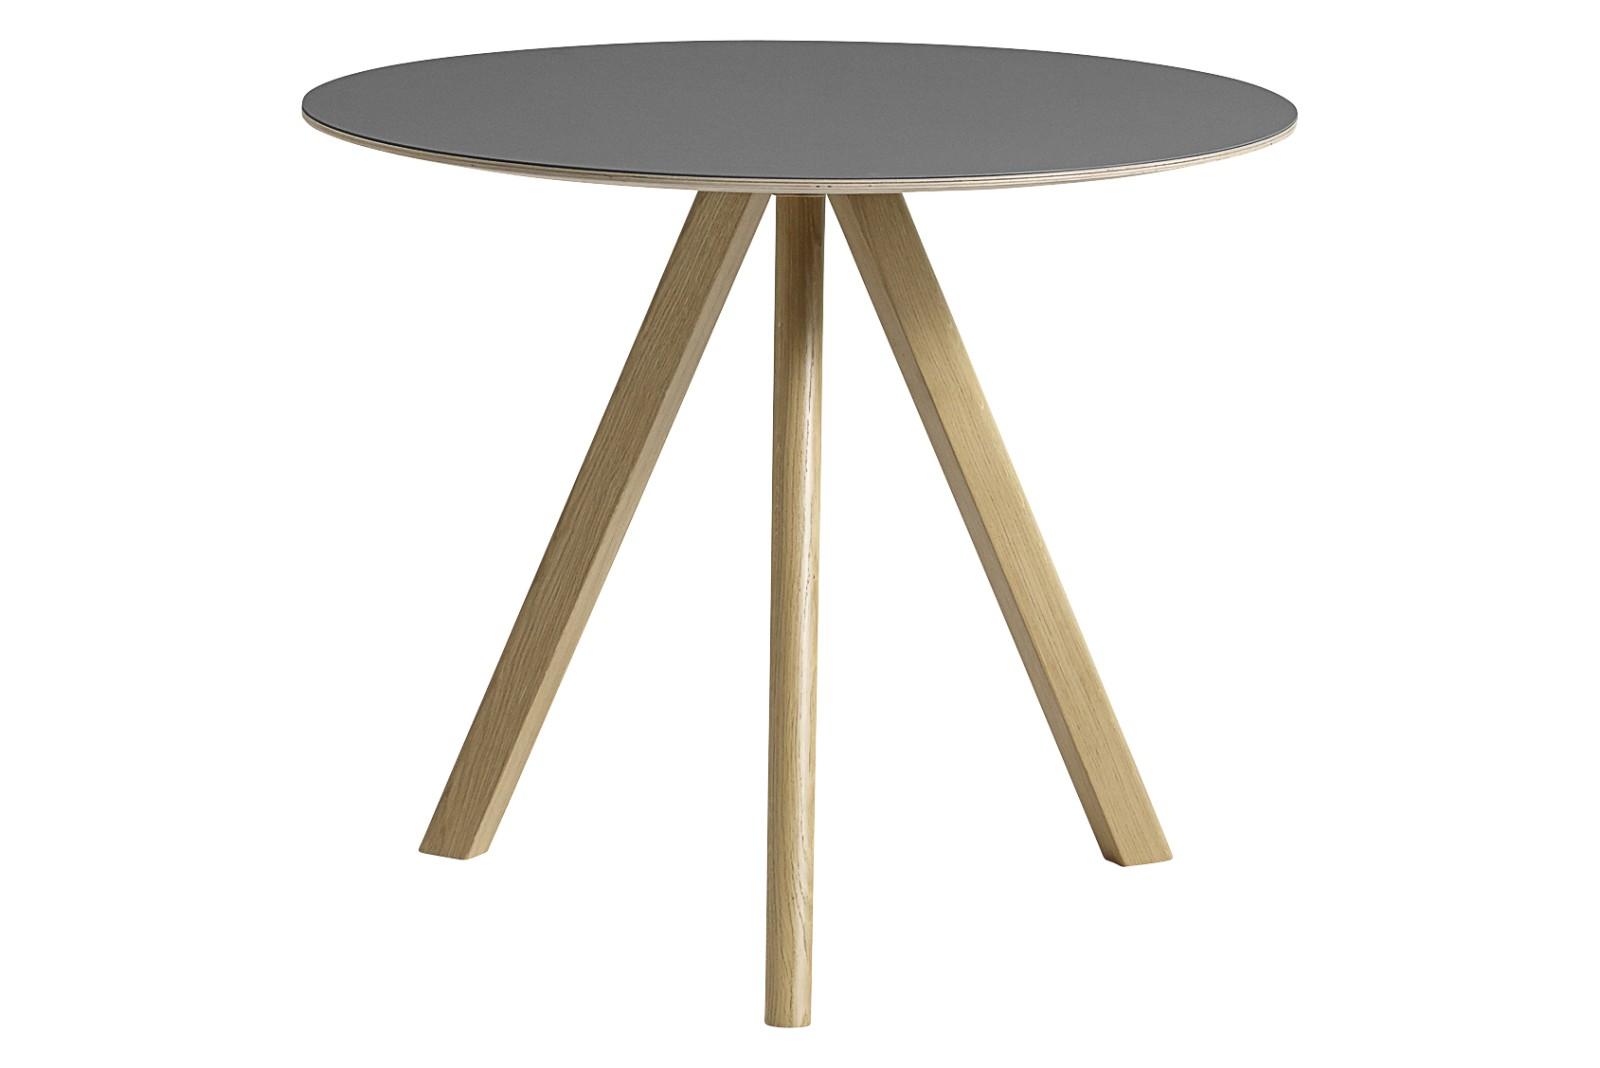 CPH 20 Round Dining Table Linoleum Grey / Wood Clear Oak, 90cm